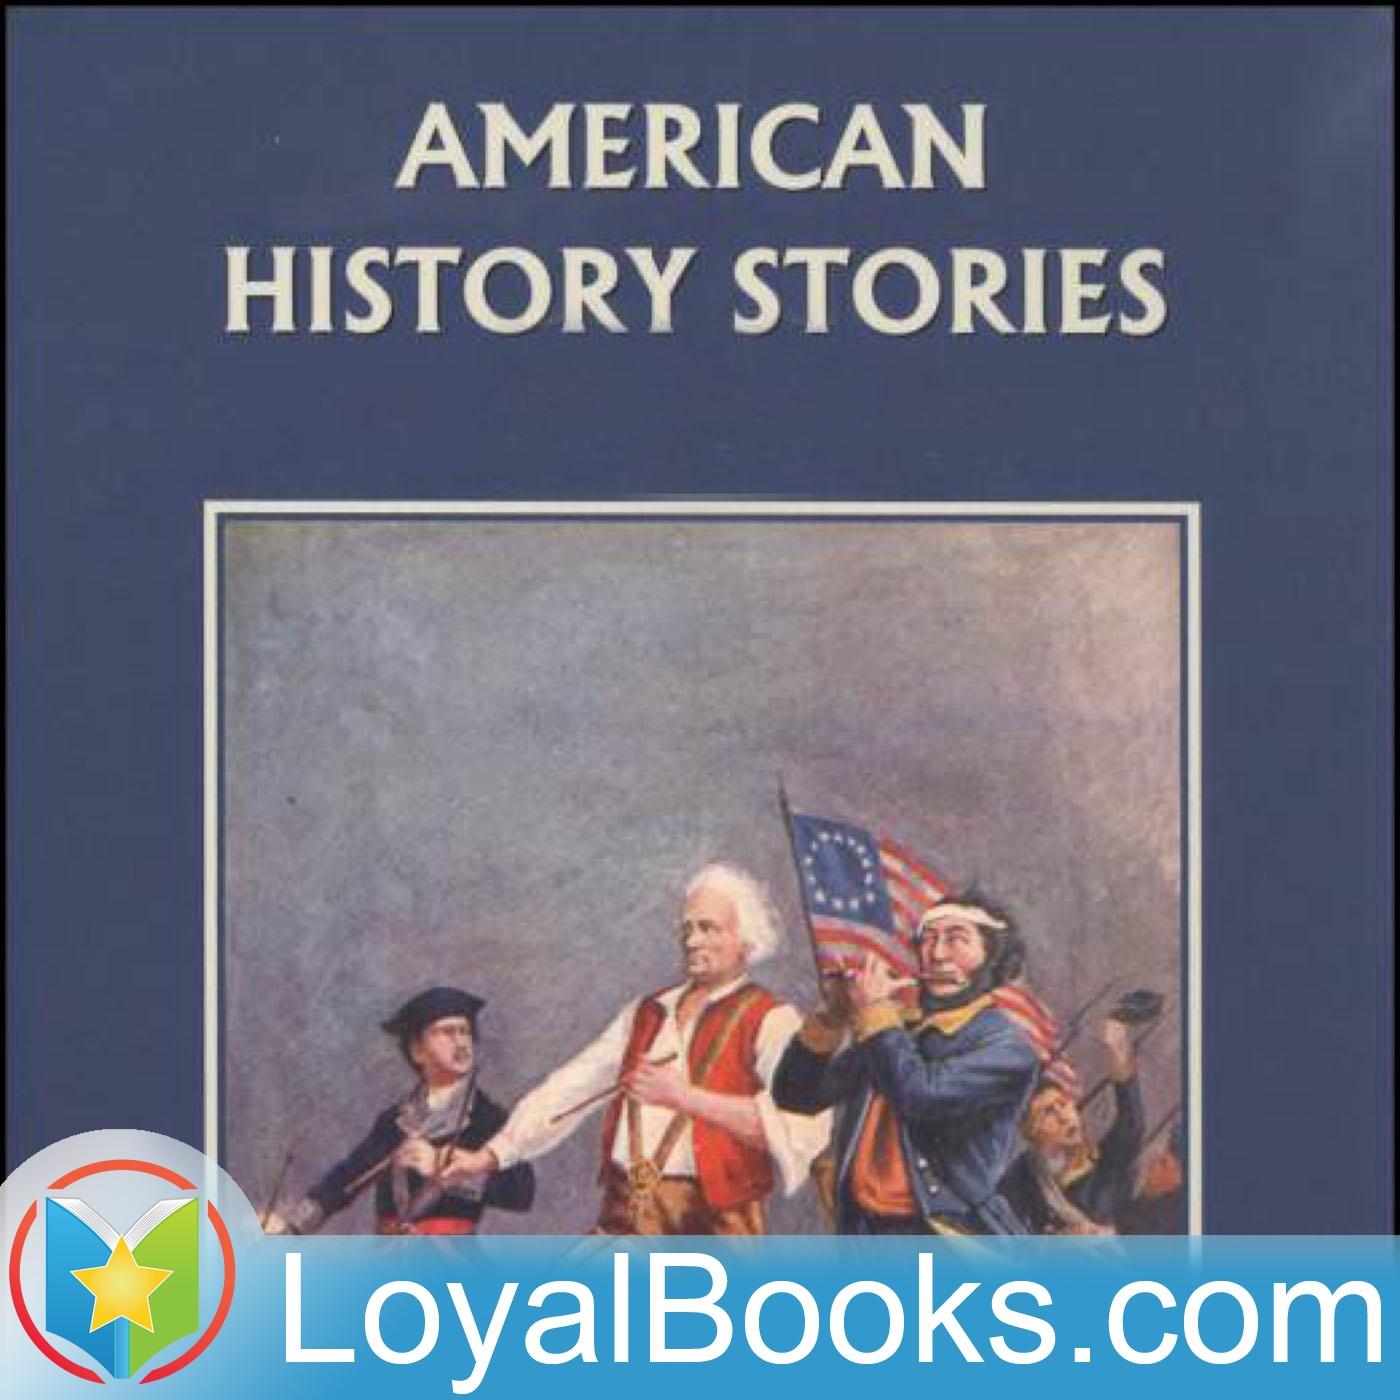 American History Stories by Mara L. Pratt  